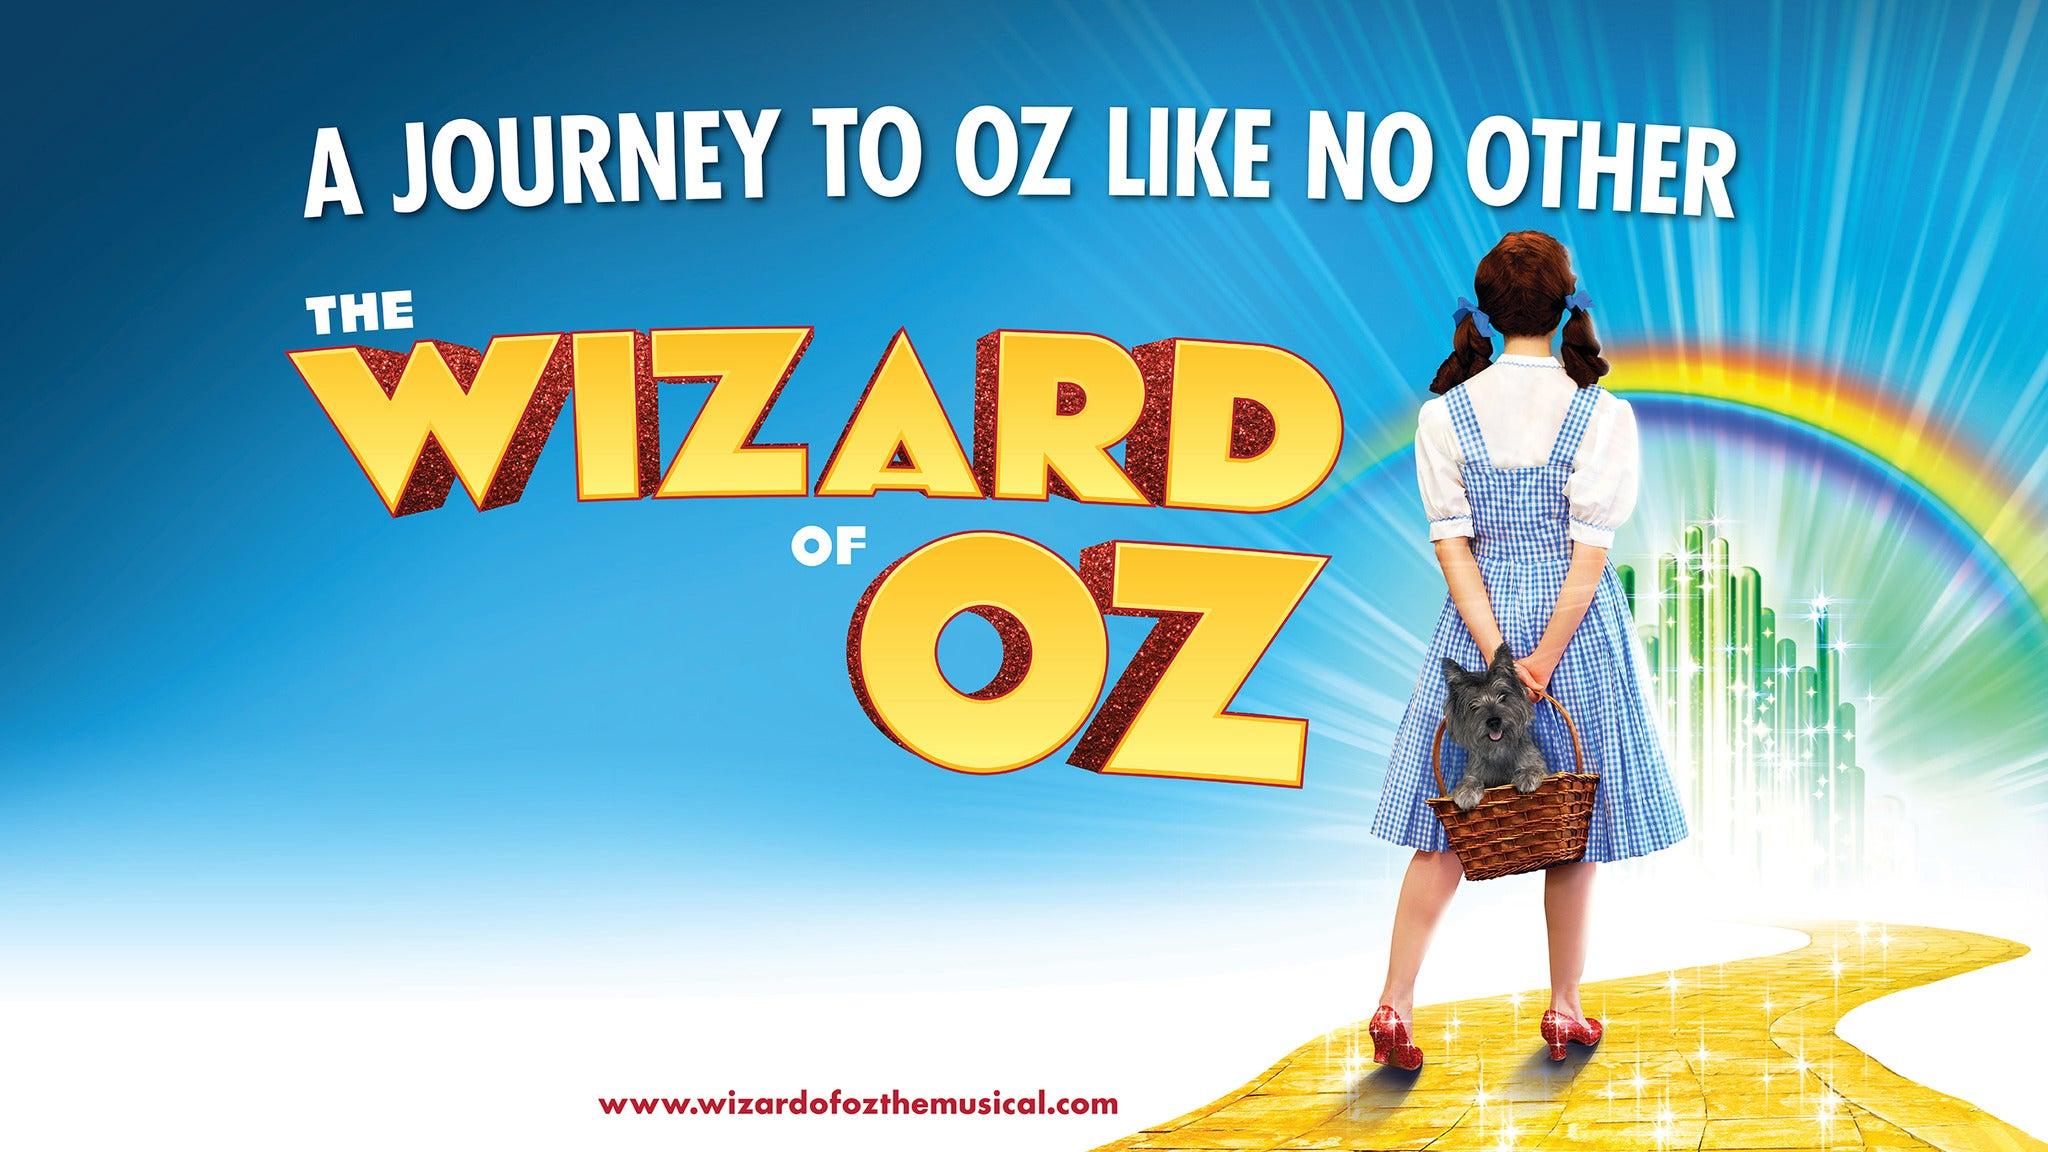 The Wizard of Oz - San Bernardino, CA 92401